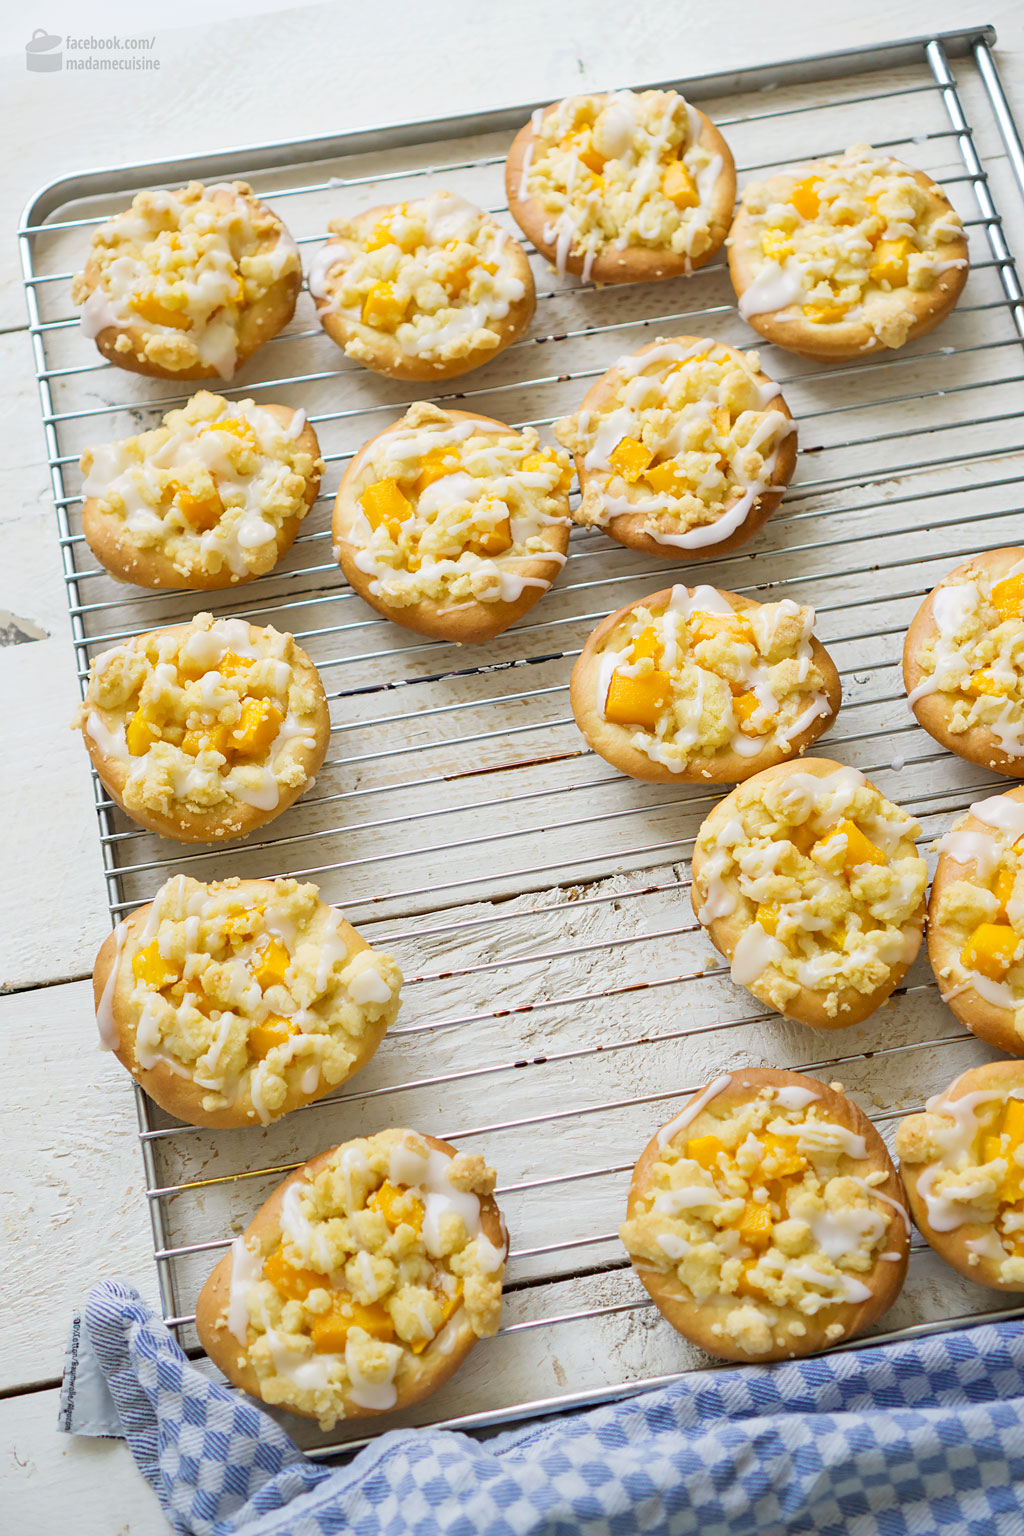 Streusel-Taler mit Mango & Limette | Madame Cuisine Rezept